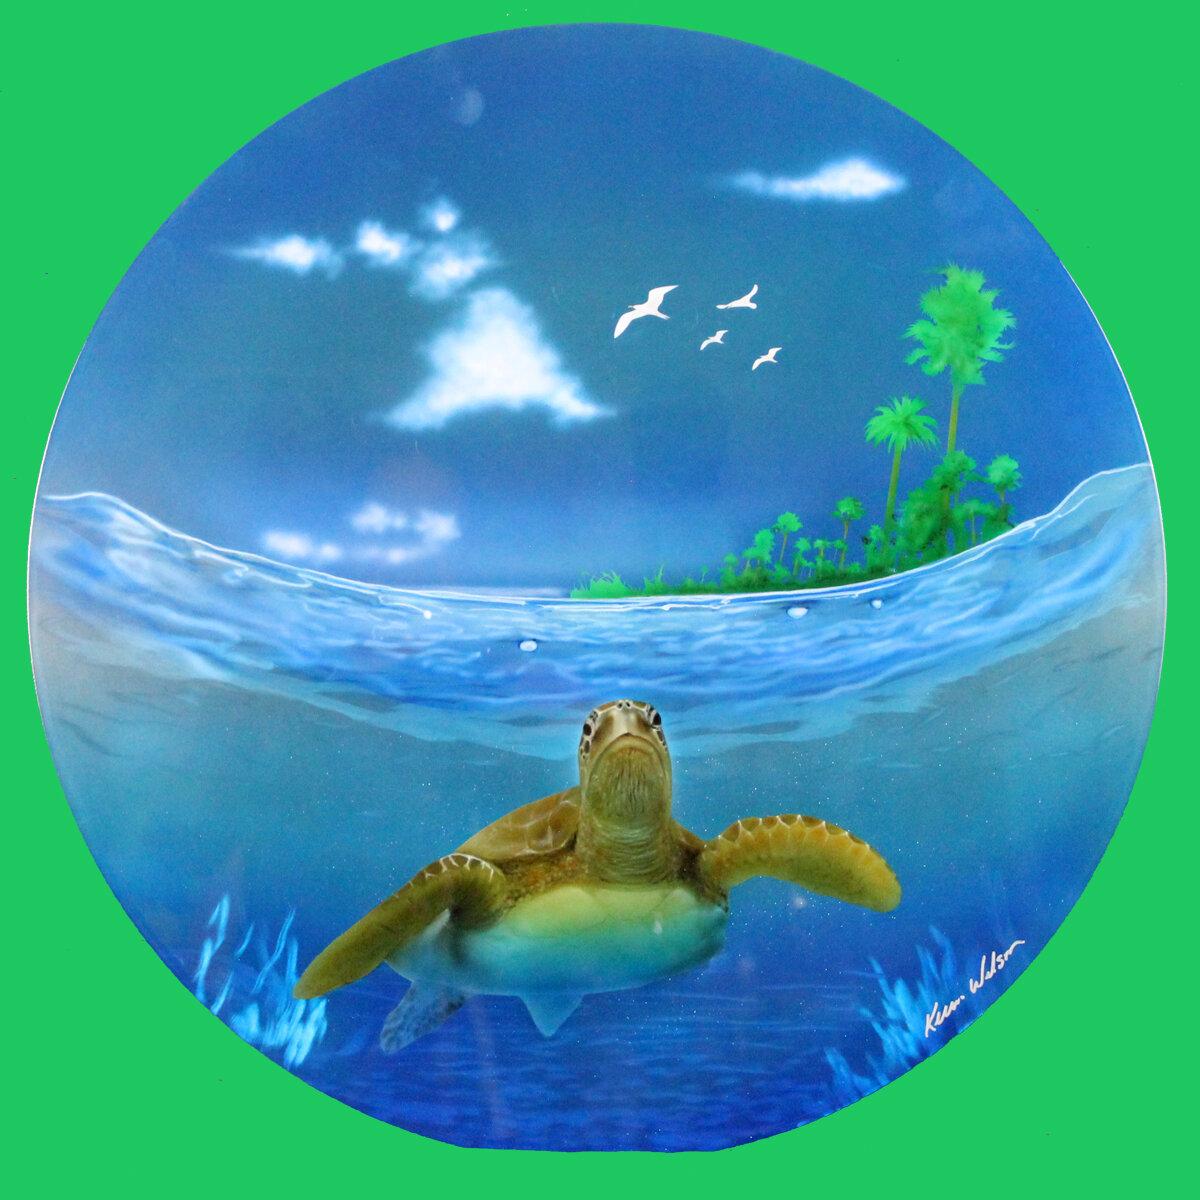 Turtle Through the Lens